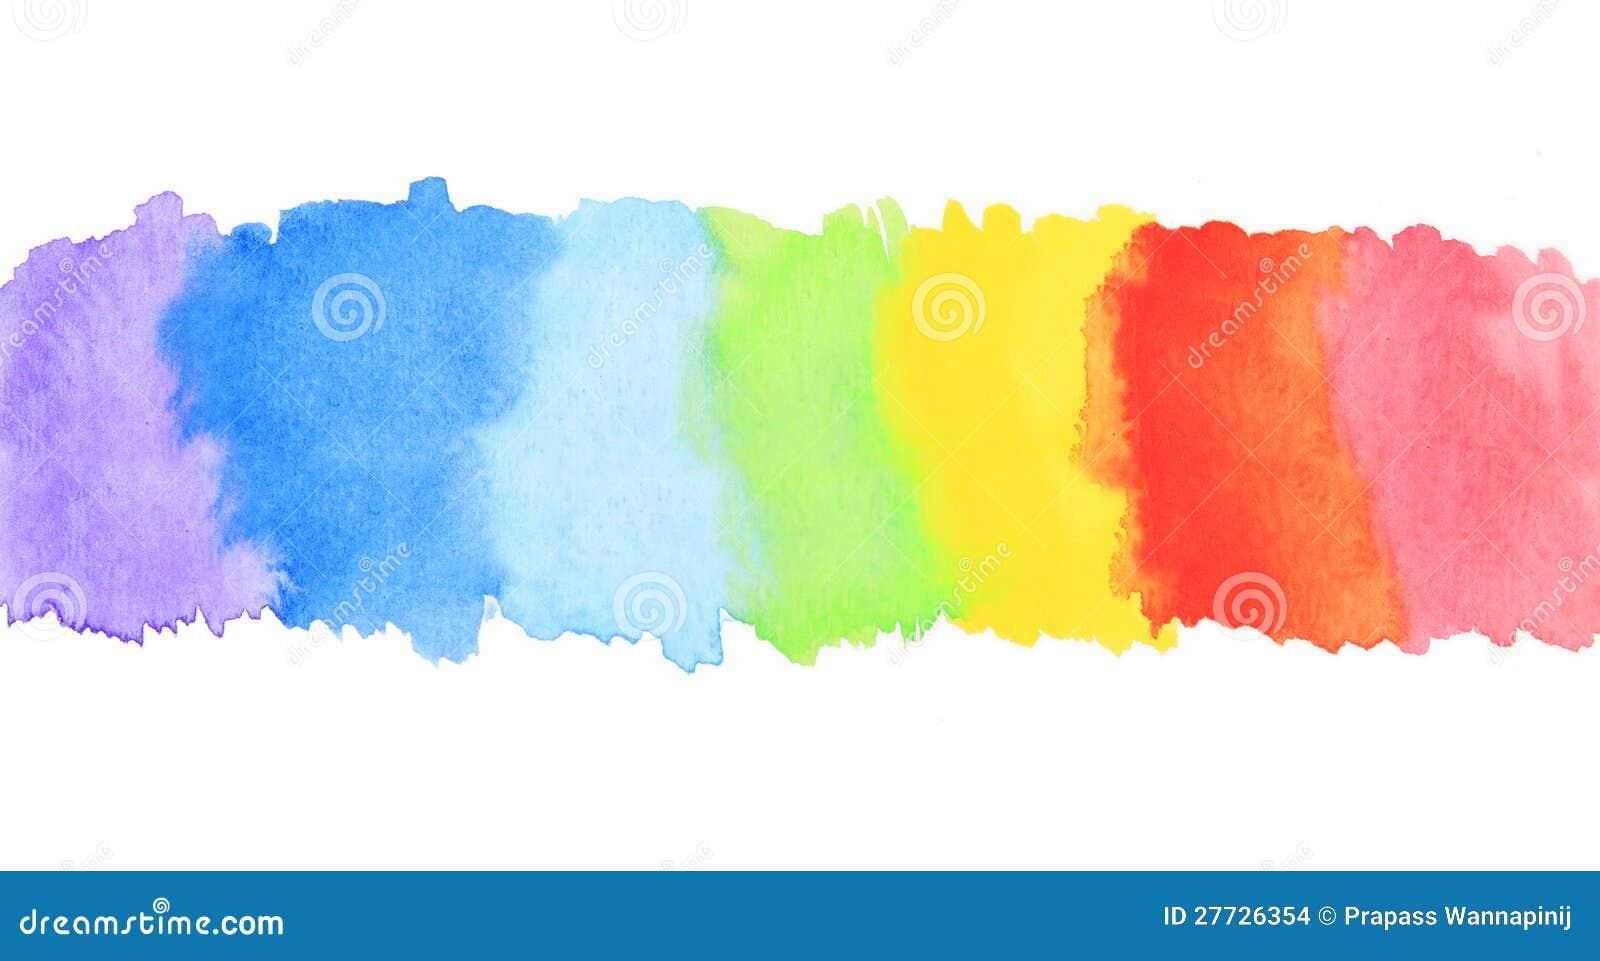 Paint texture paints background download photo color paint texture - Rainbow Watercolor Paint Stripe Stock Images Image 27726354